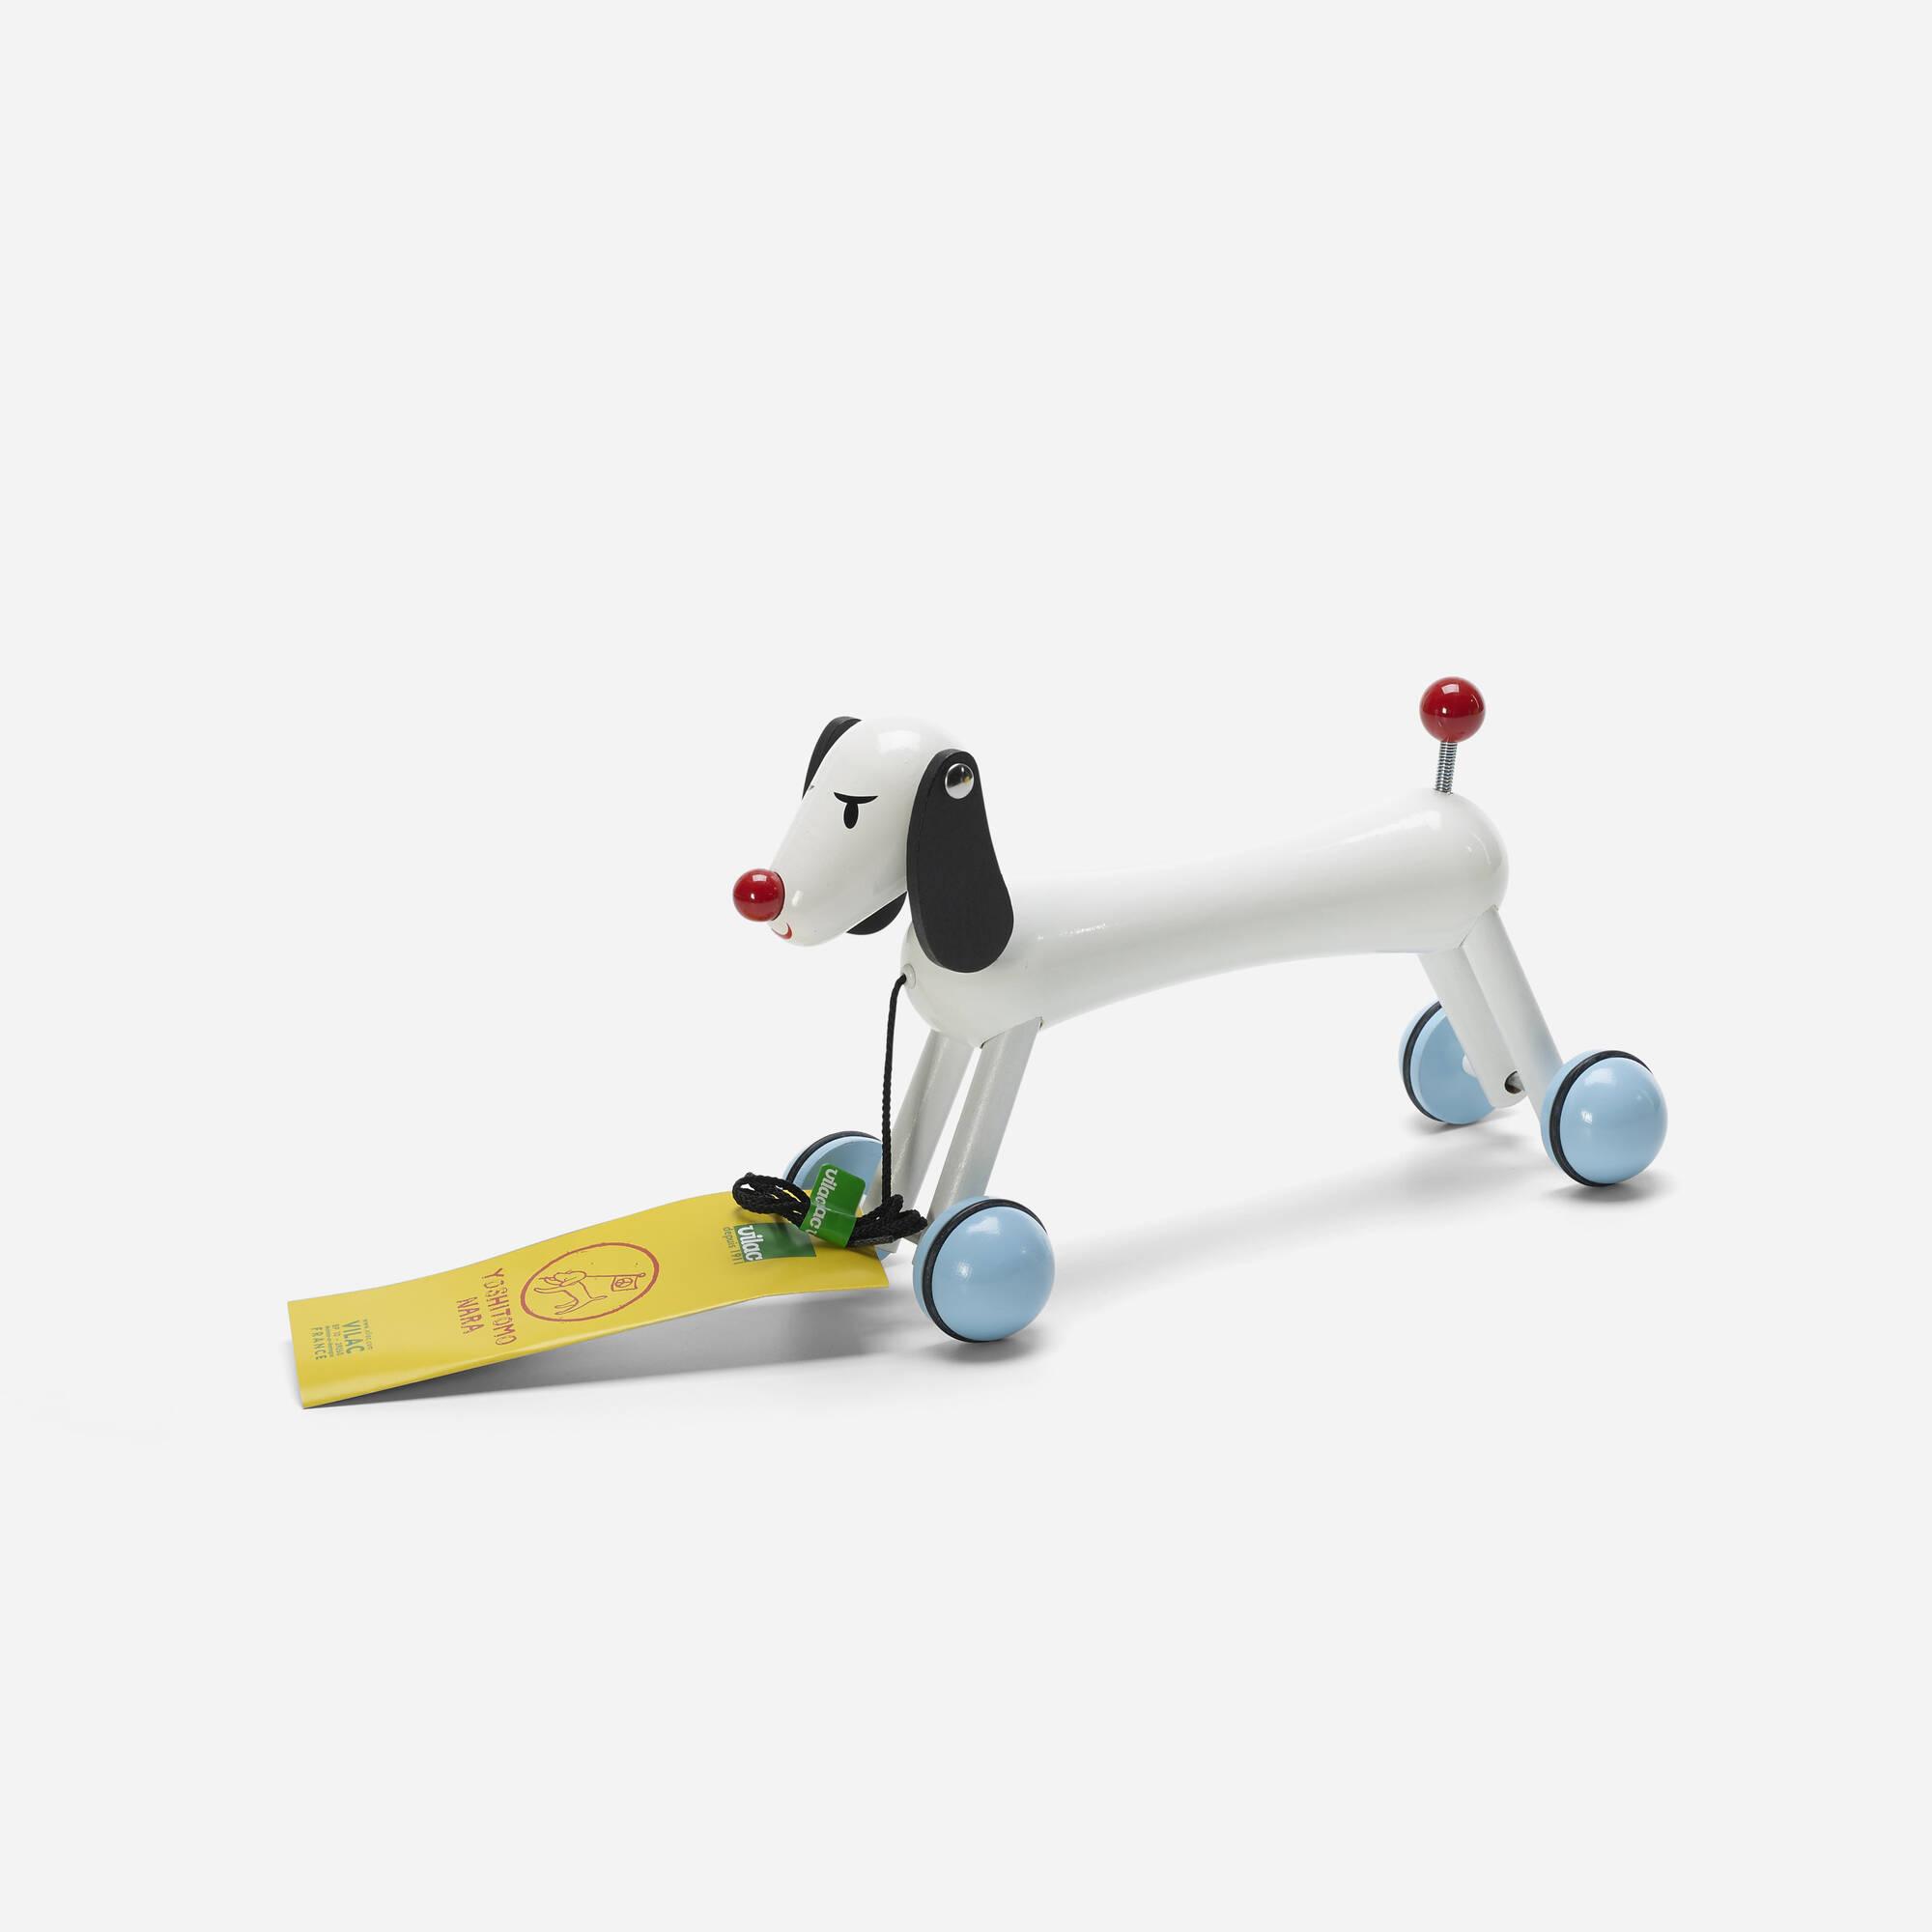 631: Yoshitomo Nara / Dog Pull Toy (1 of 2)